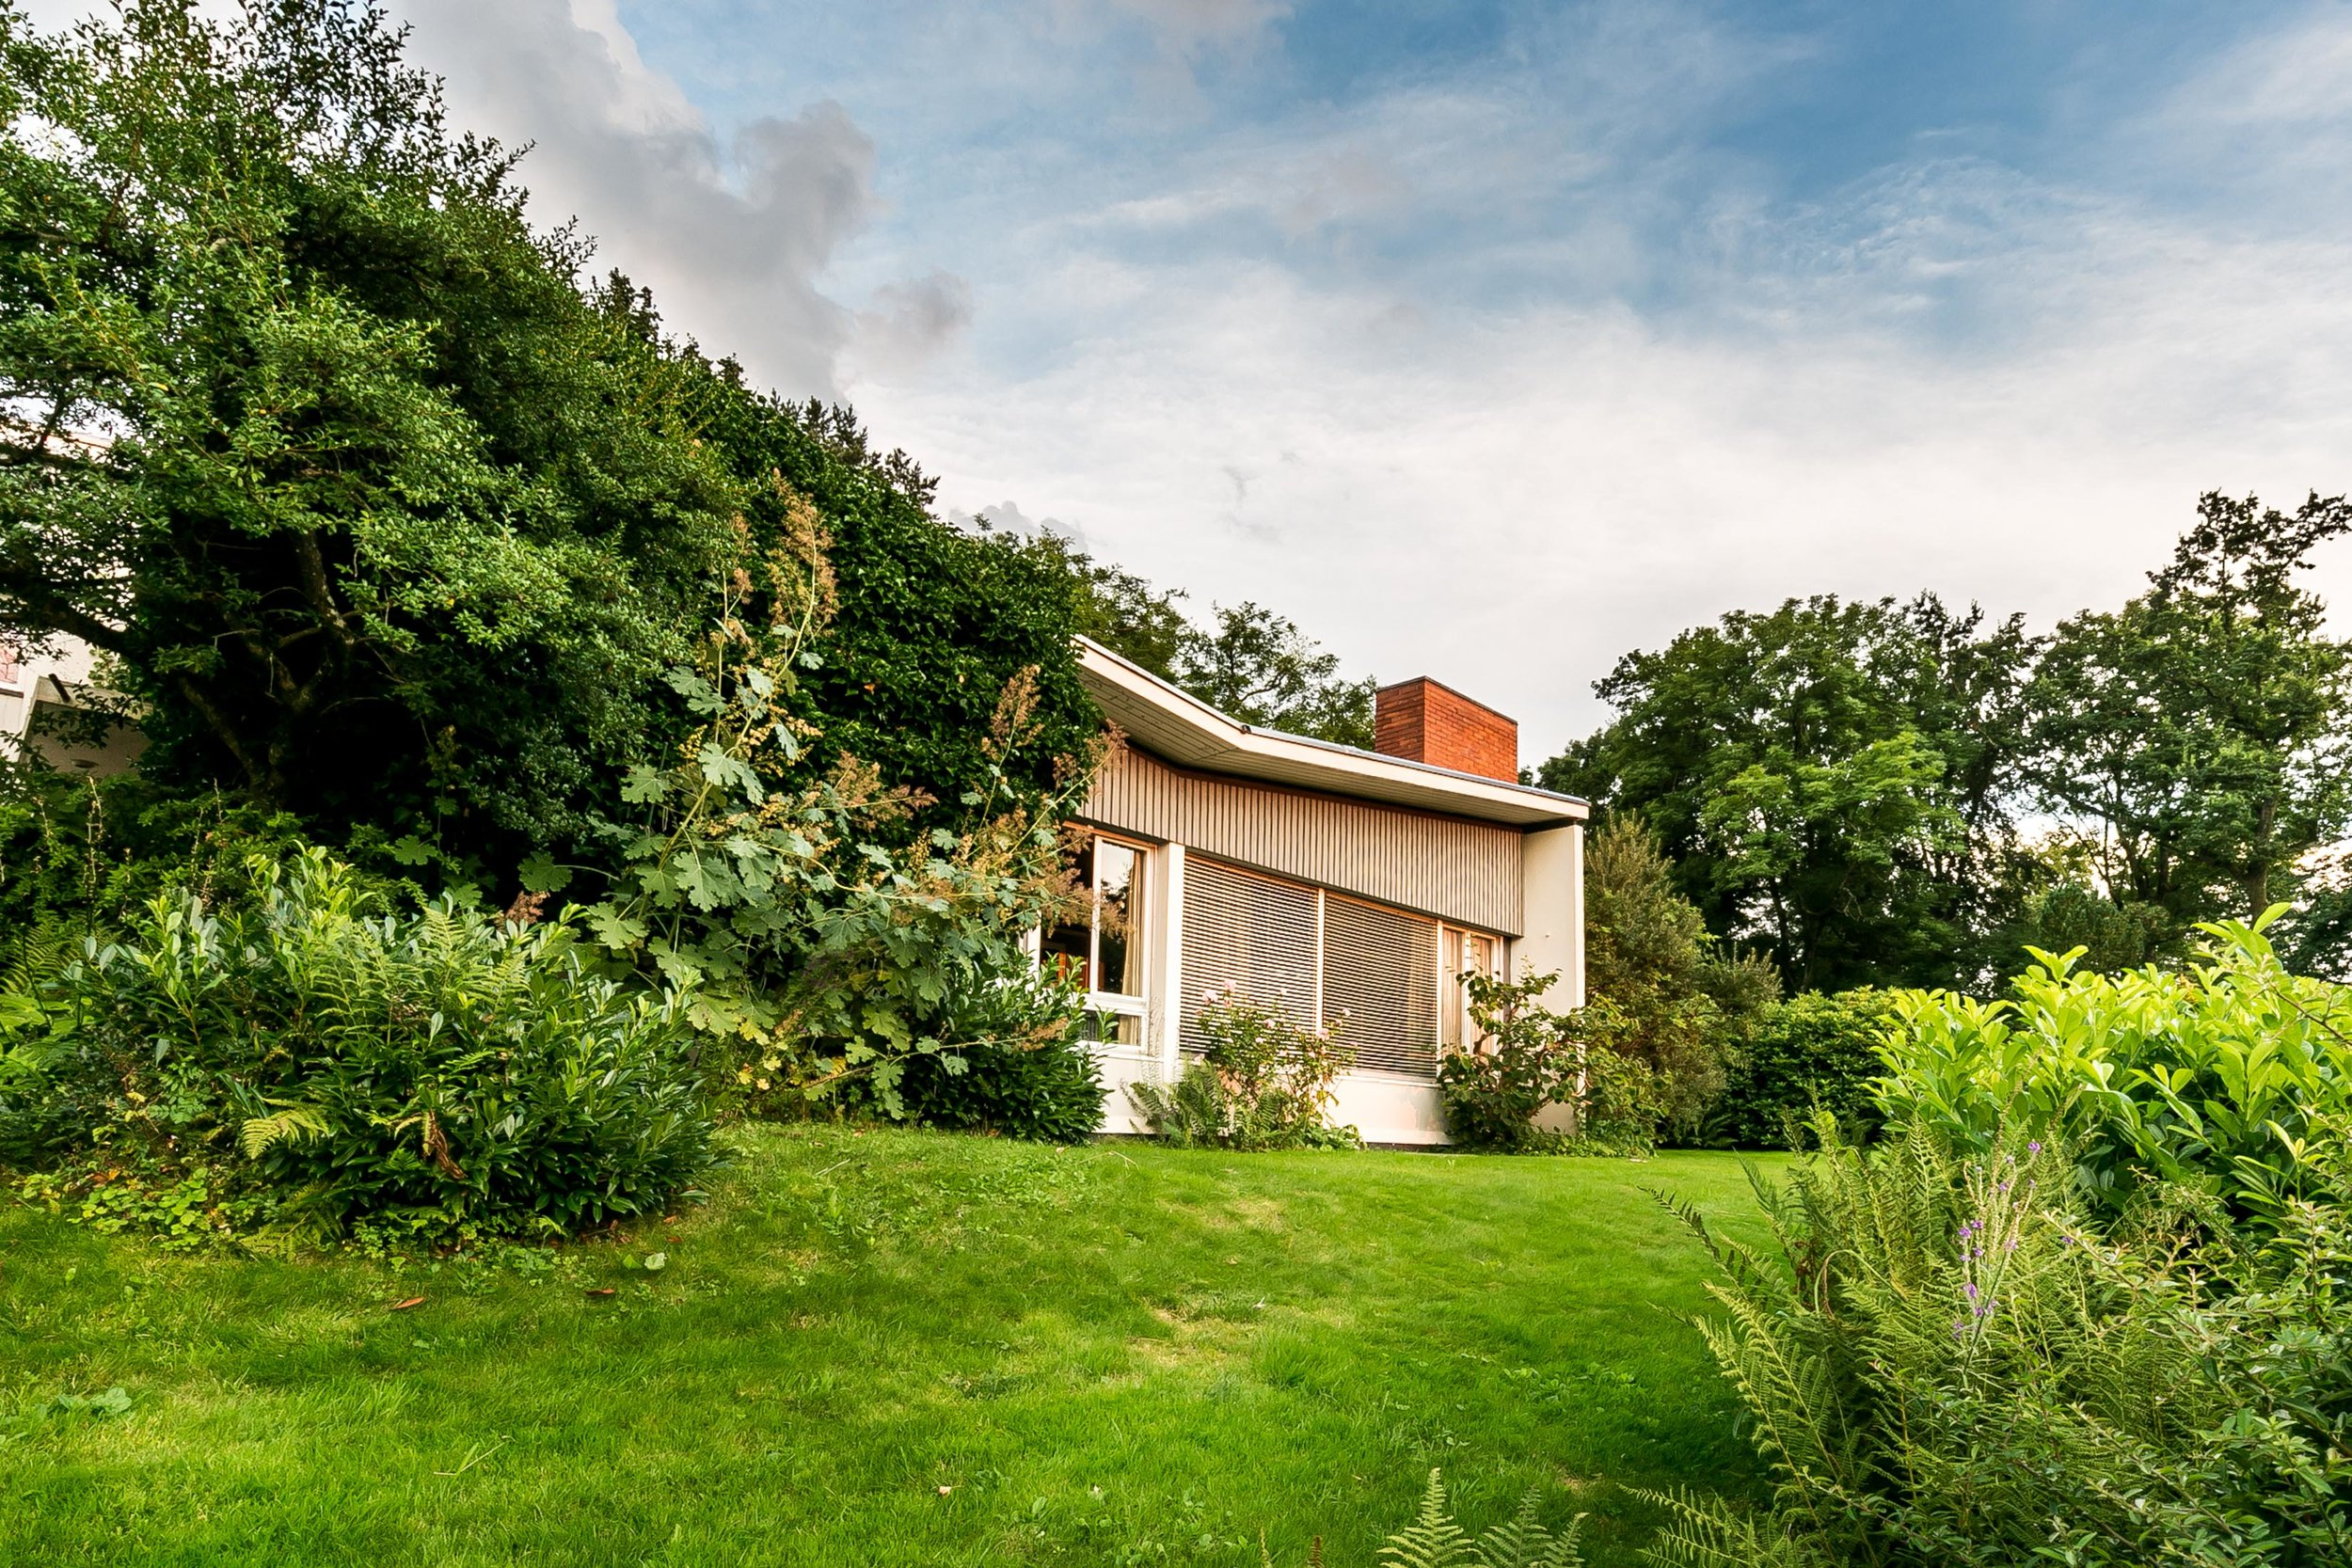 Haus Dalcher_exterior_lowres-4.jpg